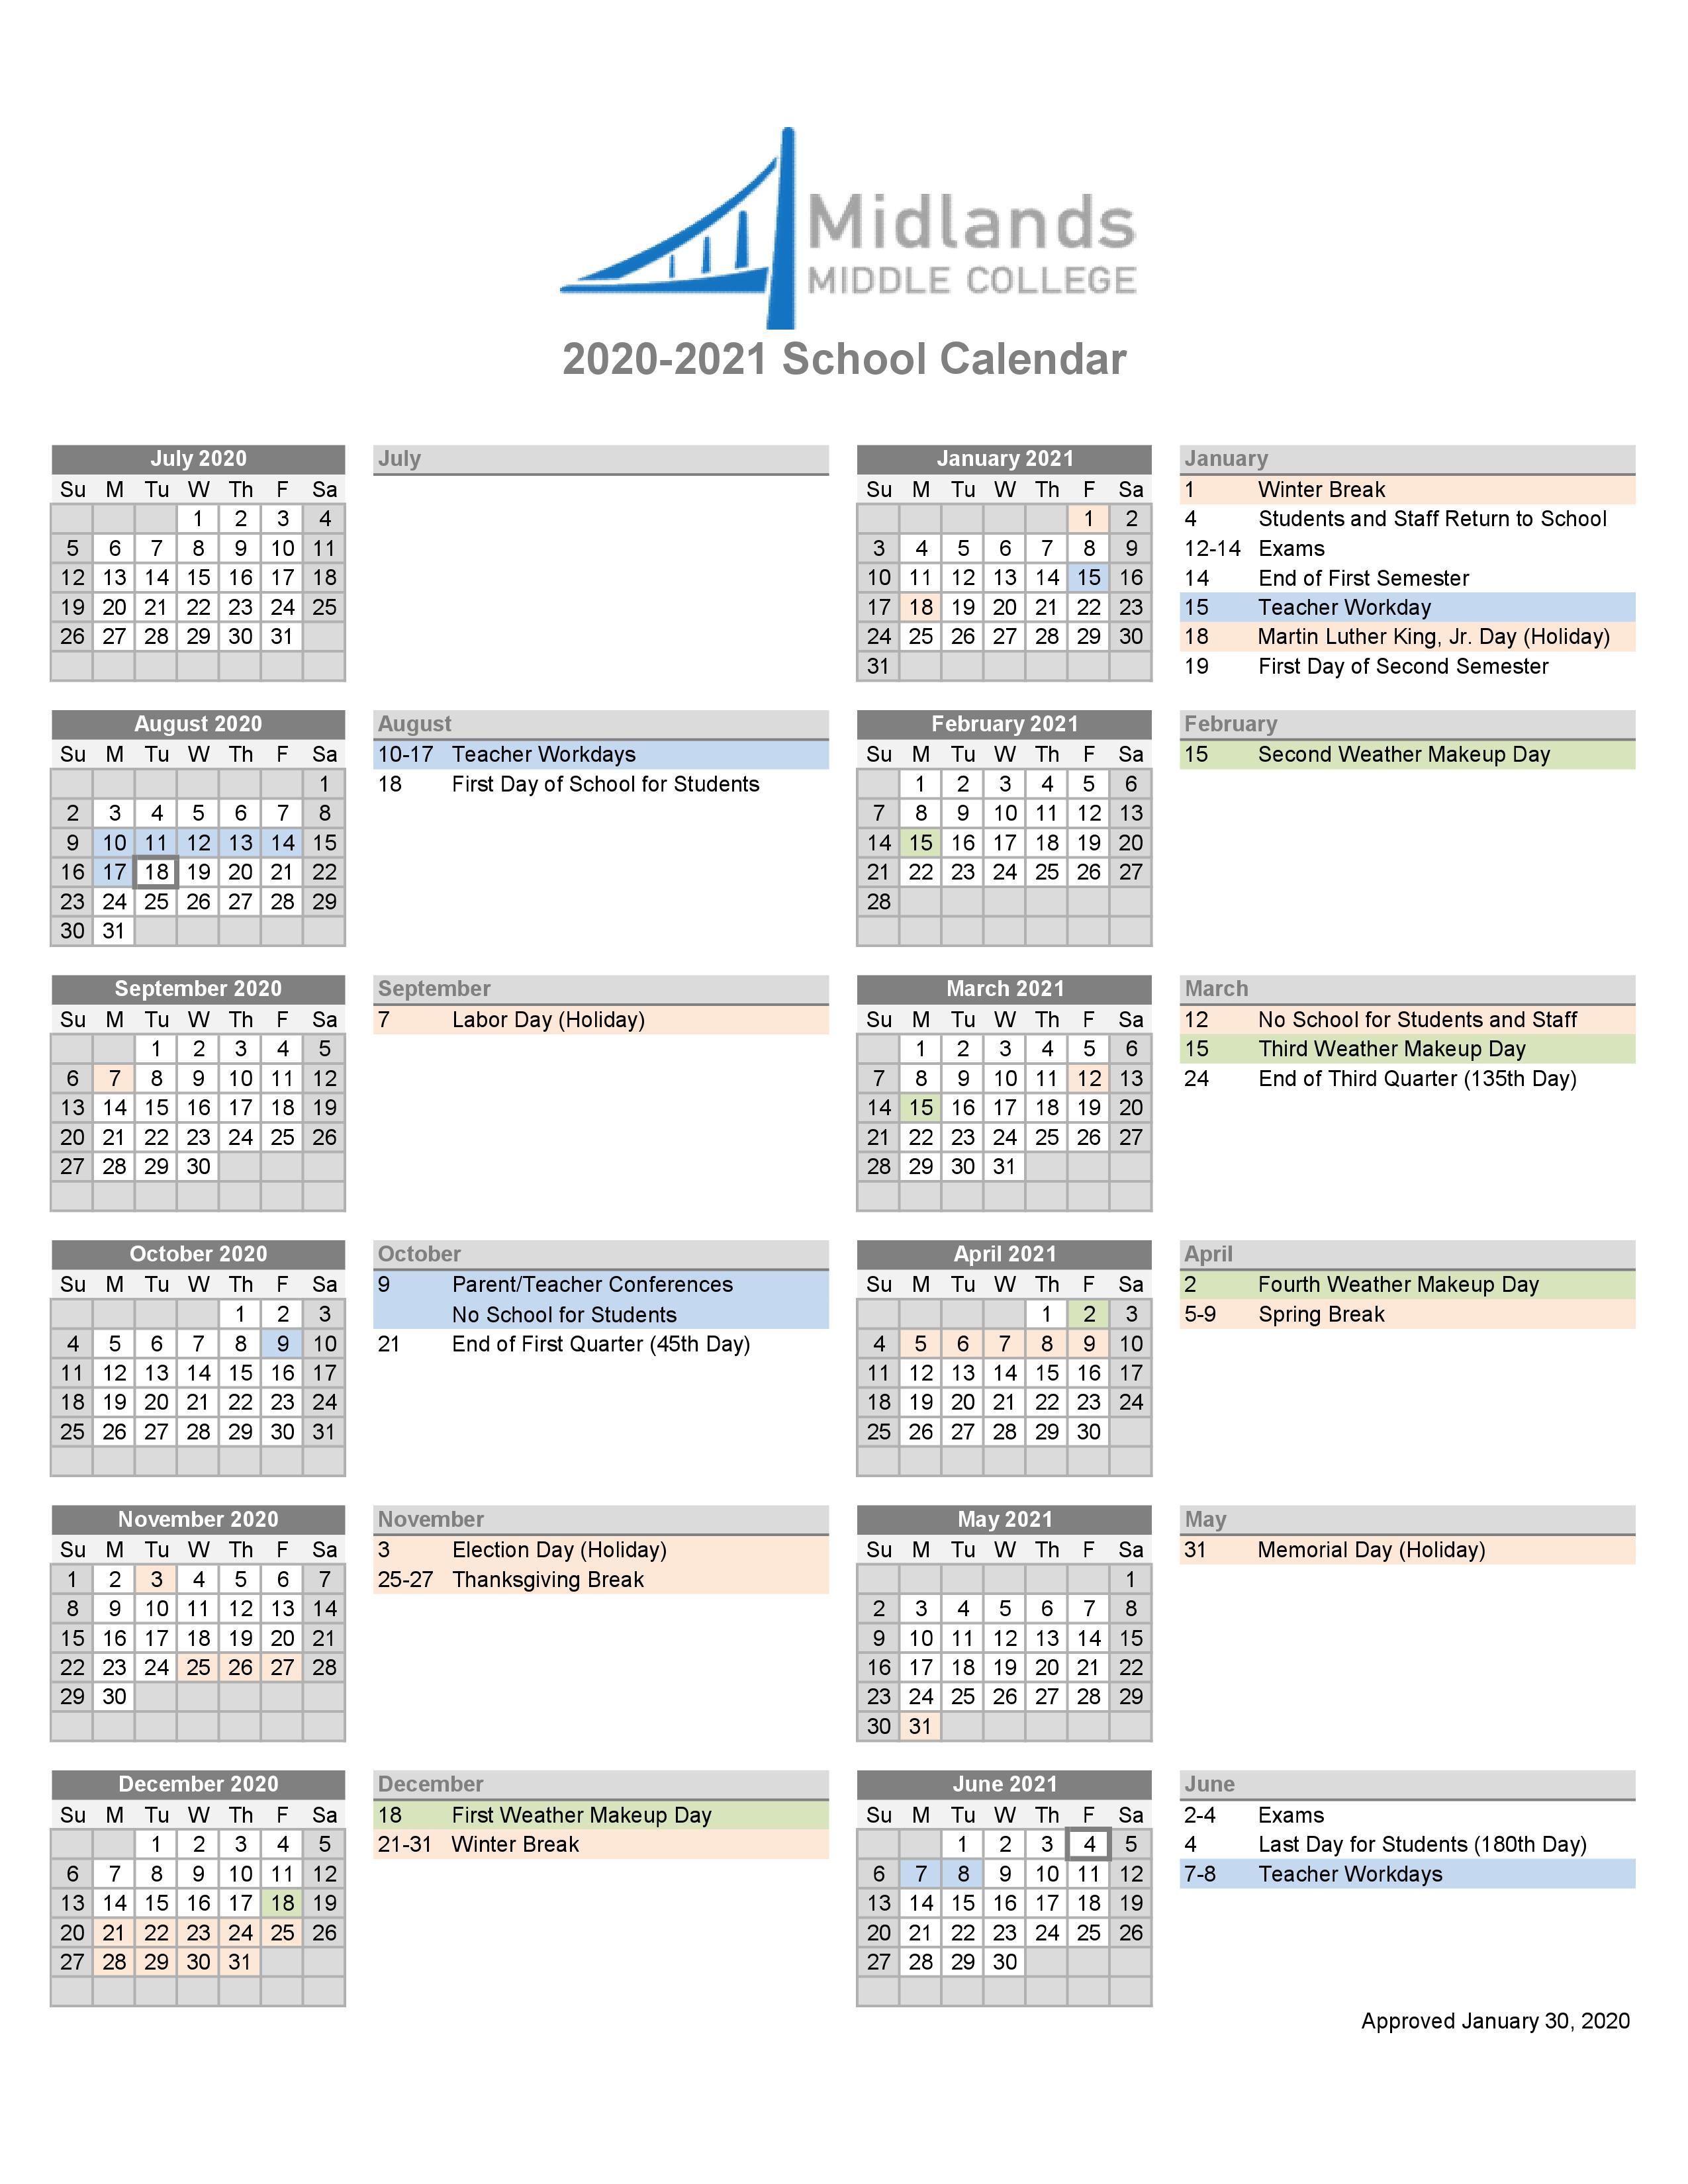 Midlands Middle College Calendar Intended For Aiken County School District Calendar 2021